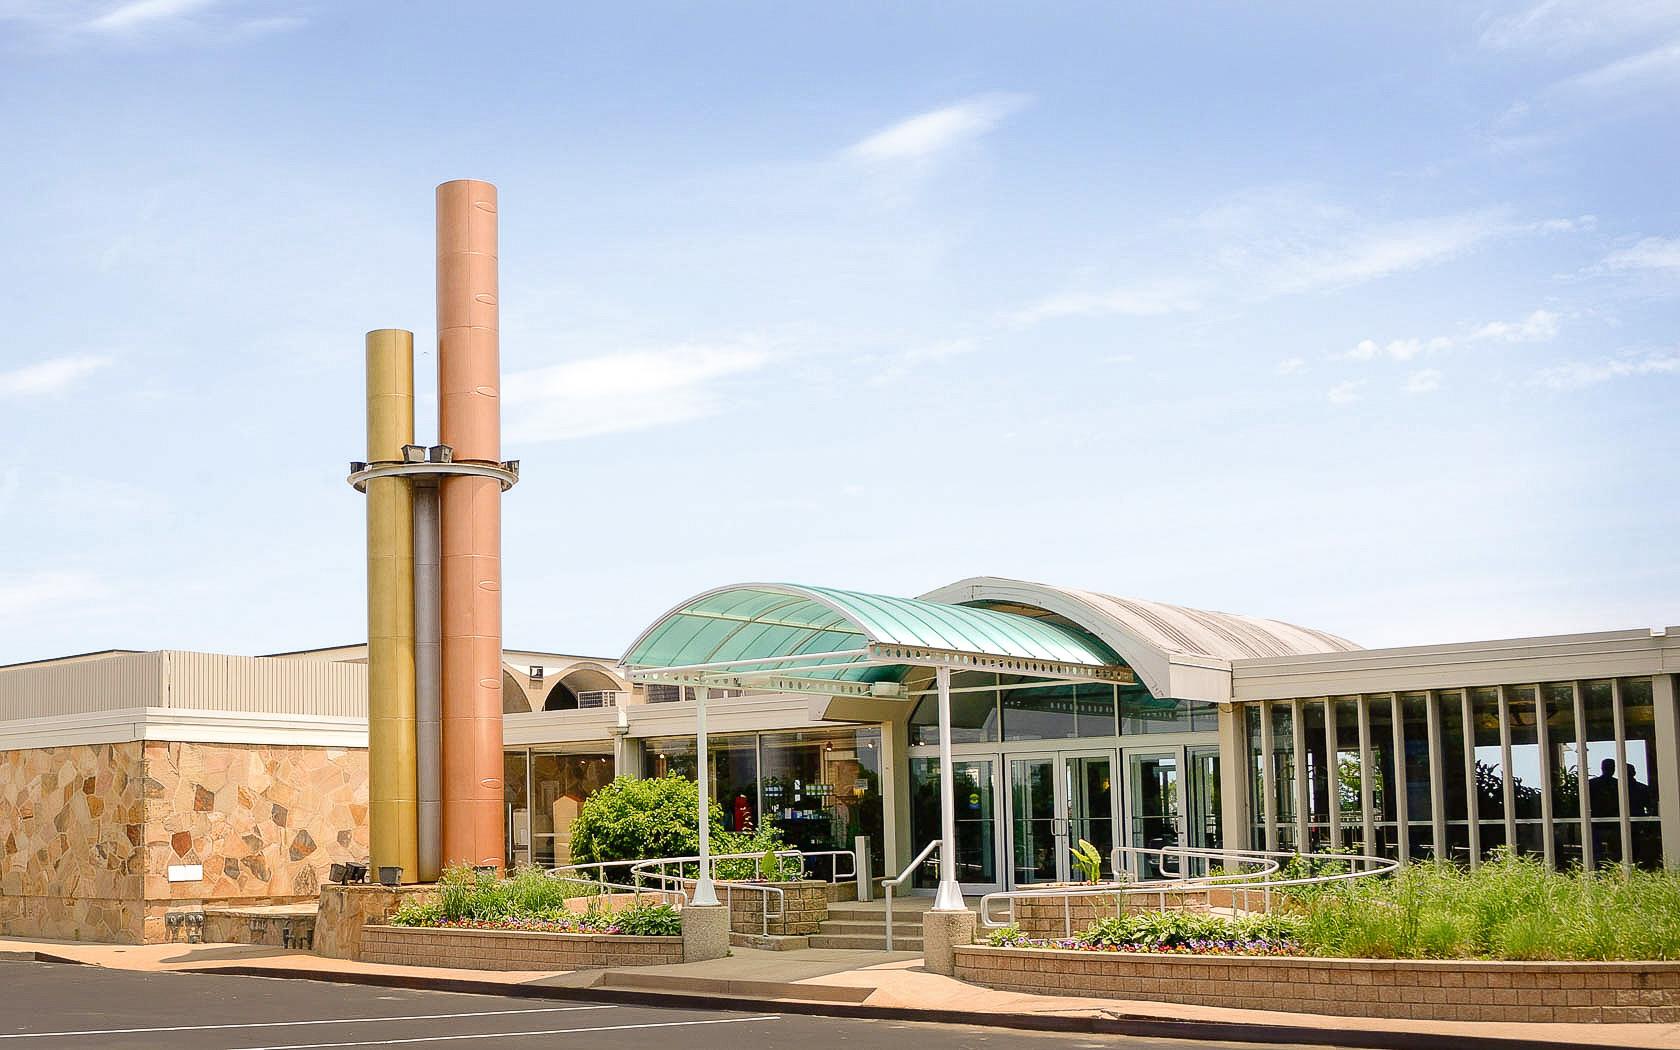 Illinois Beach Hotel & Conference Center